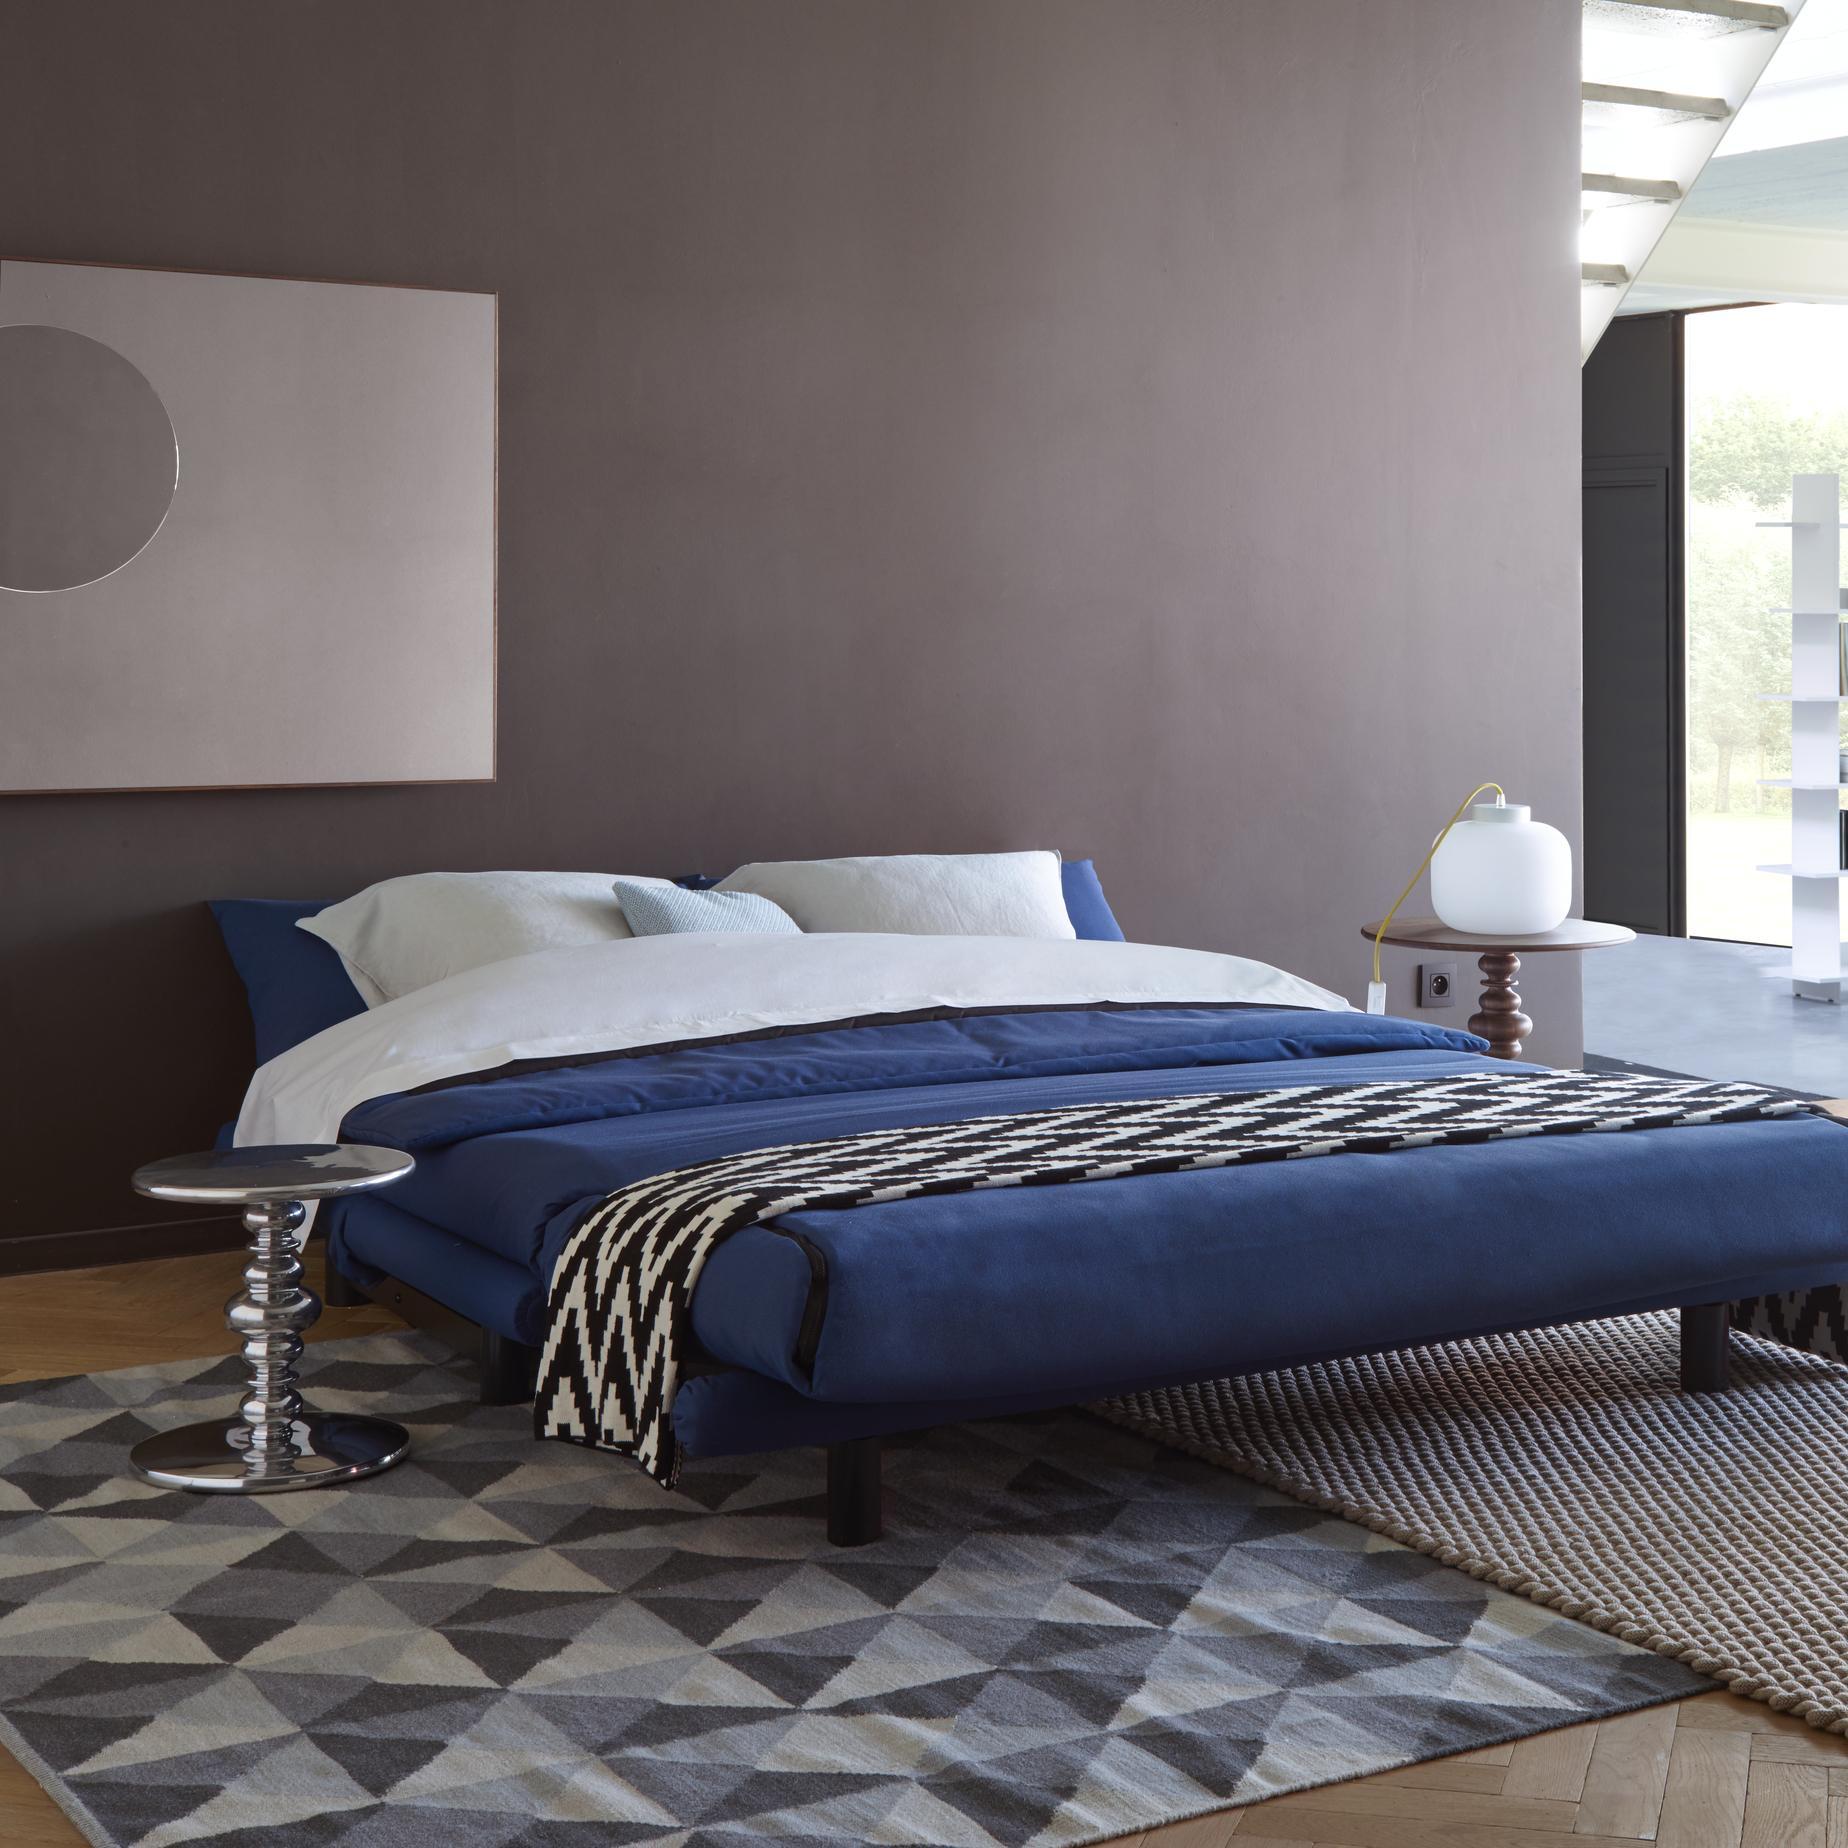 Slaapbank Ligne Roset Multy.Multy Sofa Beds From Designer Claude Brisson Ligne Roset